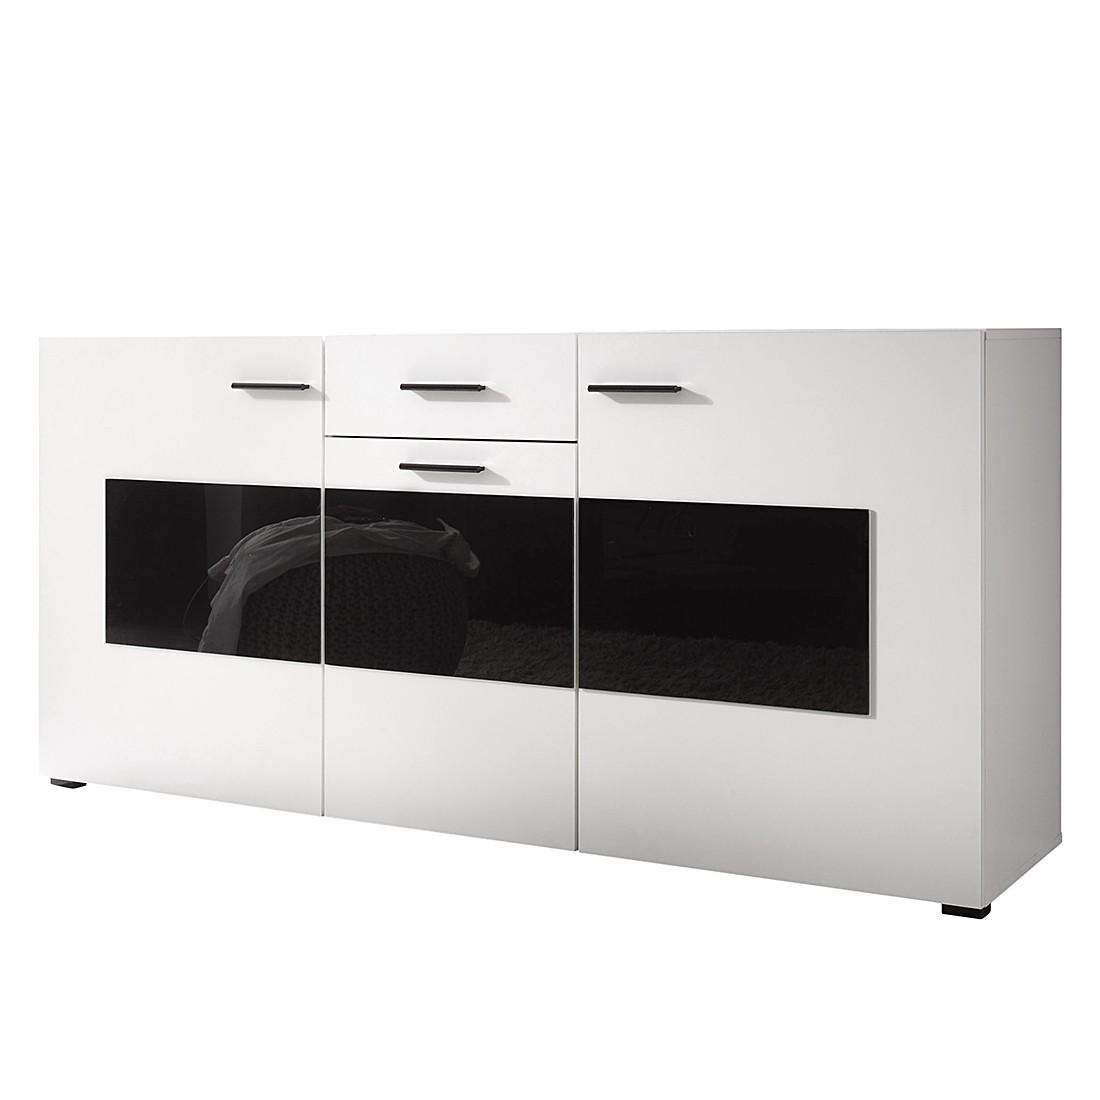 sideboard madis wei schwarz roomscape g nstig bestellen. Black Bedroom Furniture Sets. Home Design Ideas